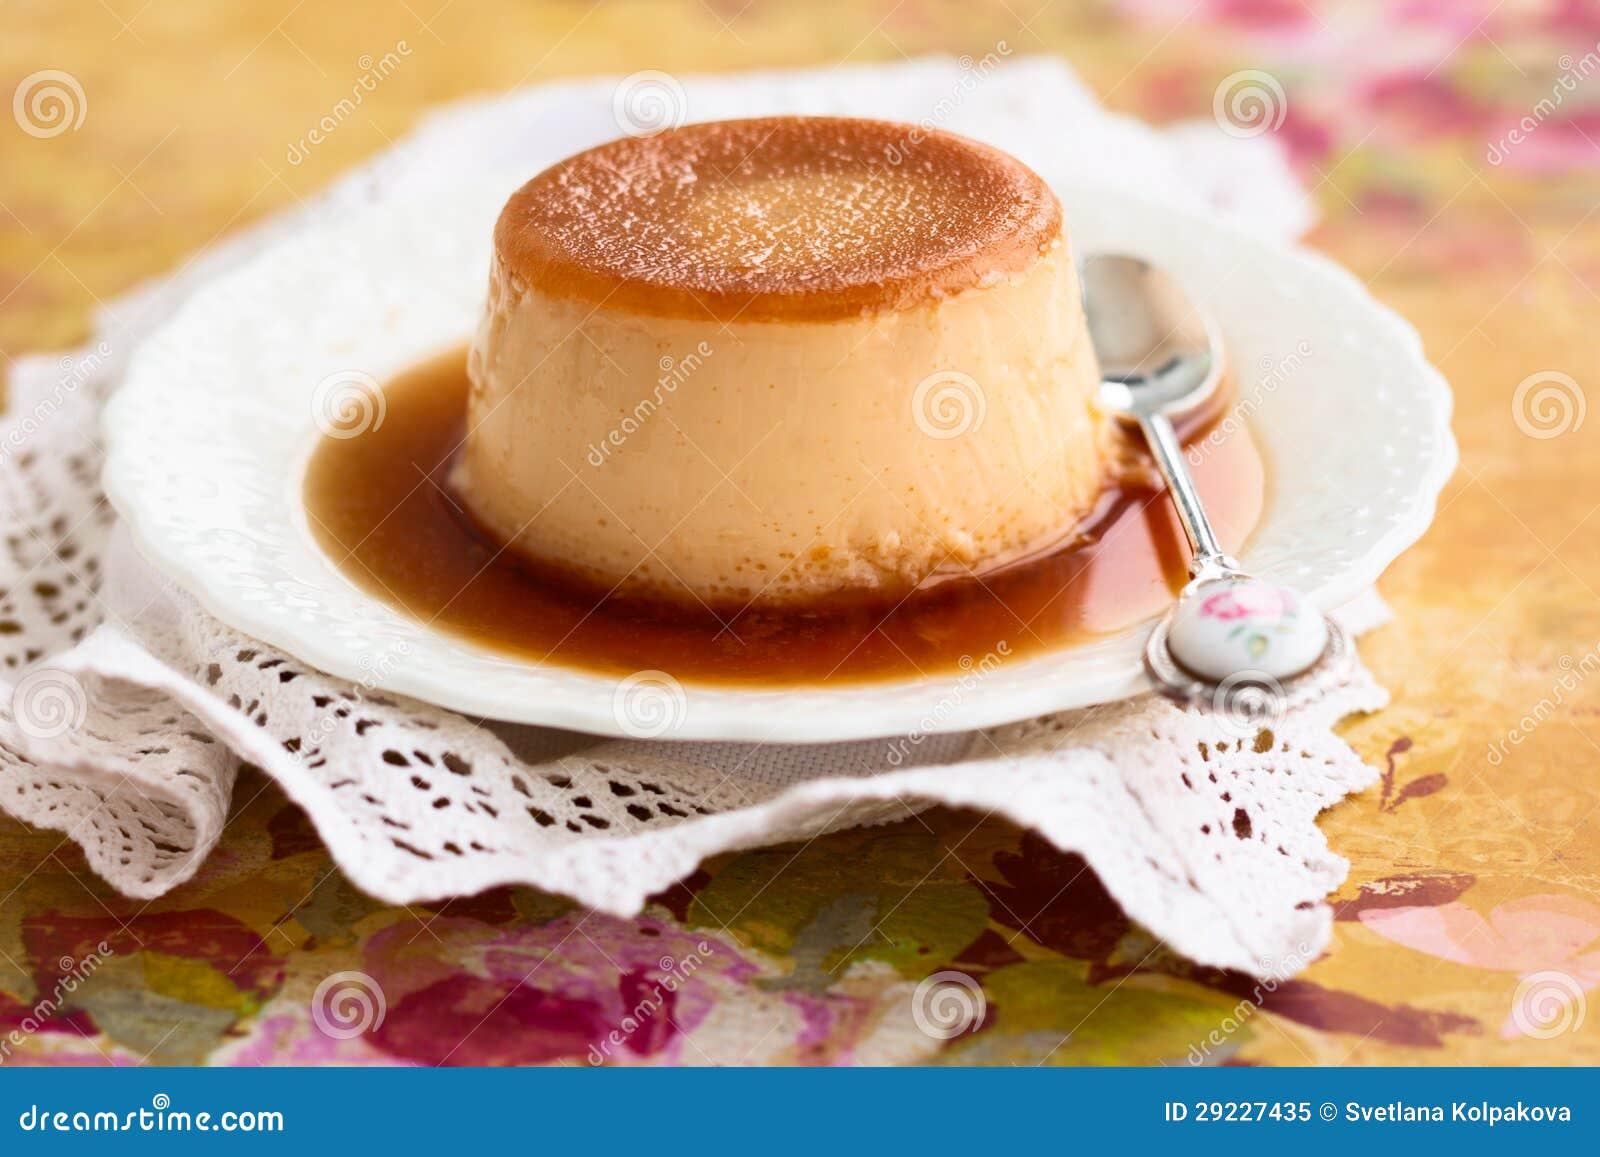 Download Caramelo de nata imagem de stock. Imagem de ninguém, mousse - 29227435